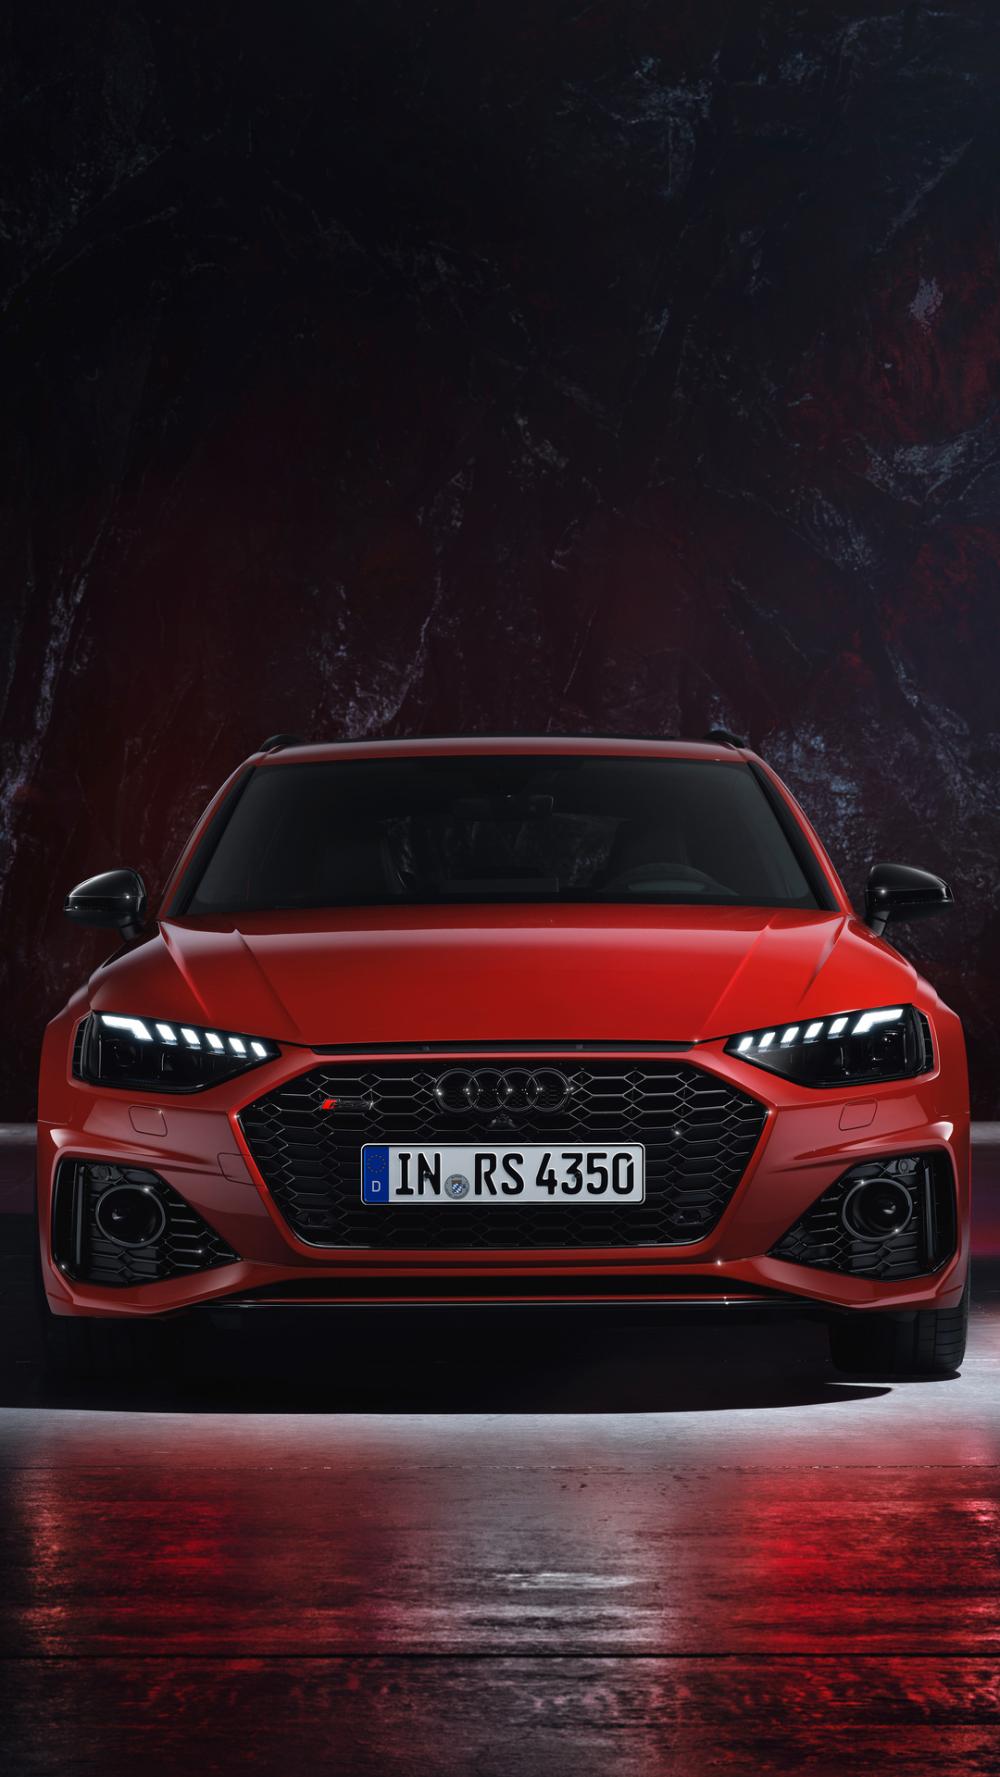 Audi Rs 4 Avant 5k In 1080x1920 Resolution Audi Rs Audi Cars Luxury Cars Audi